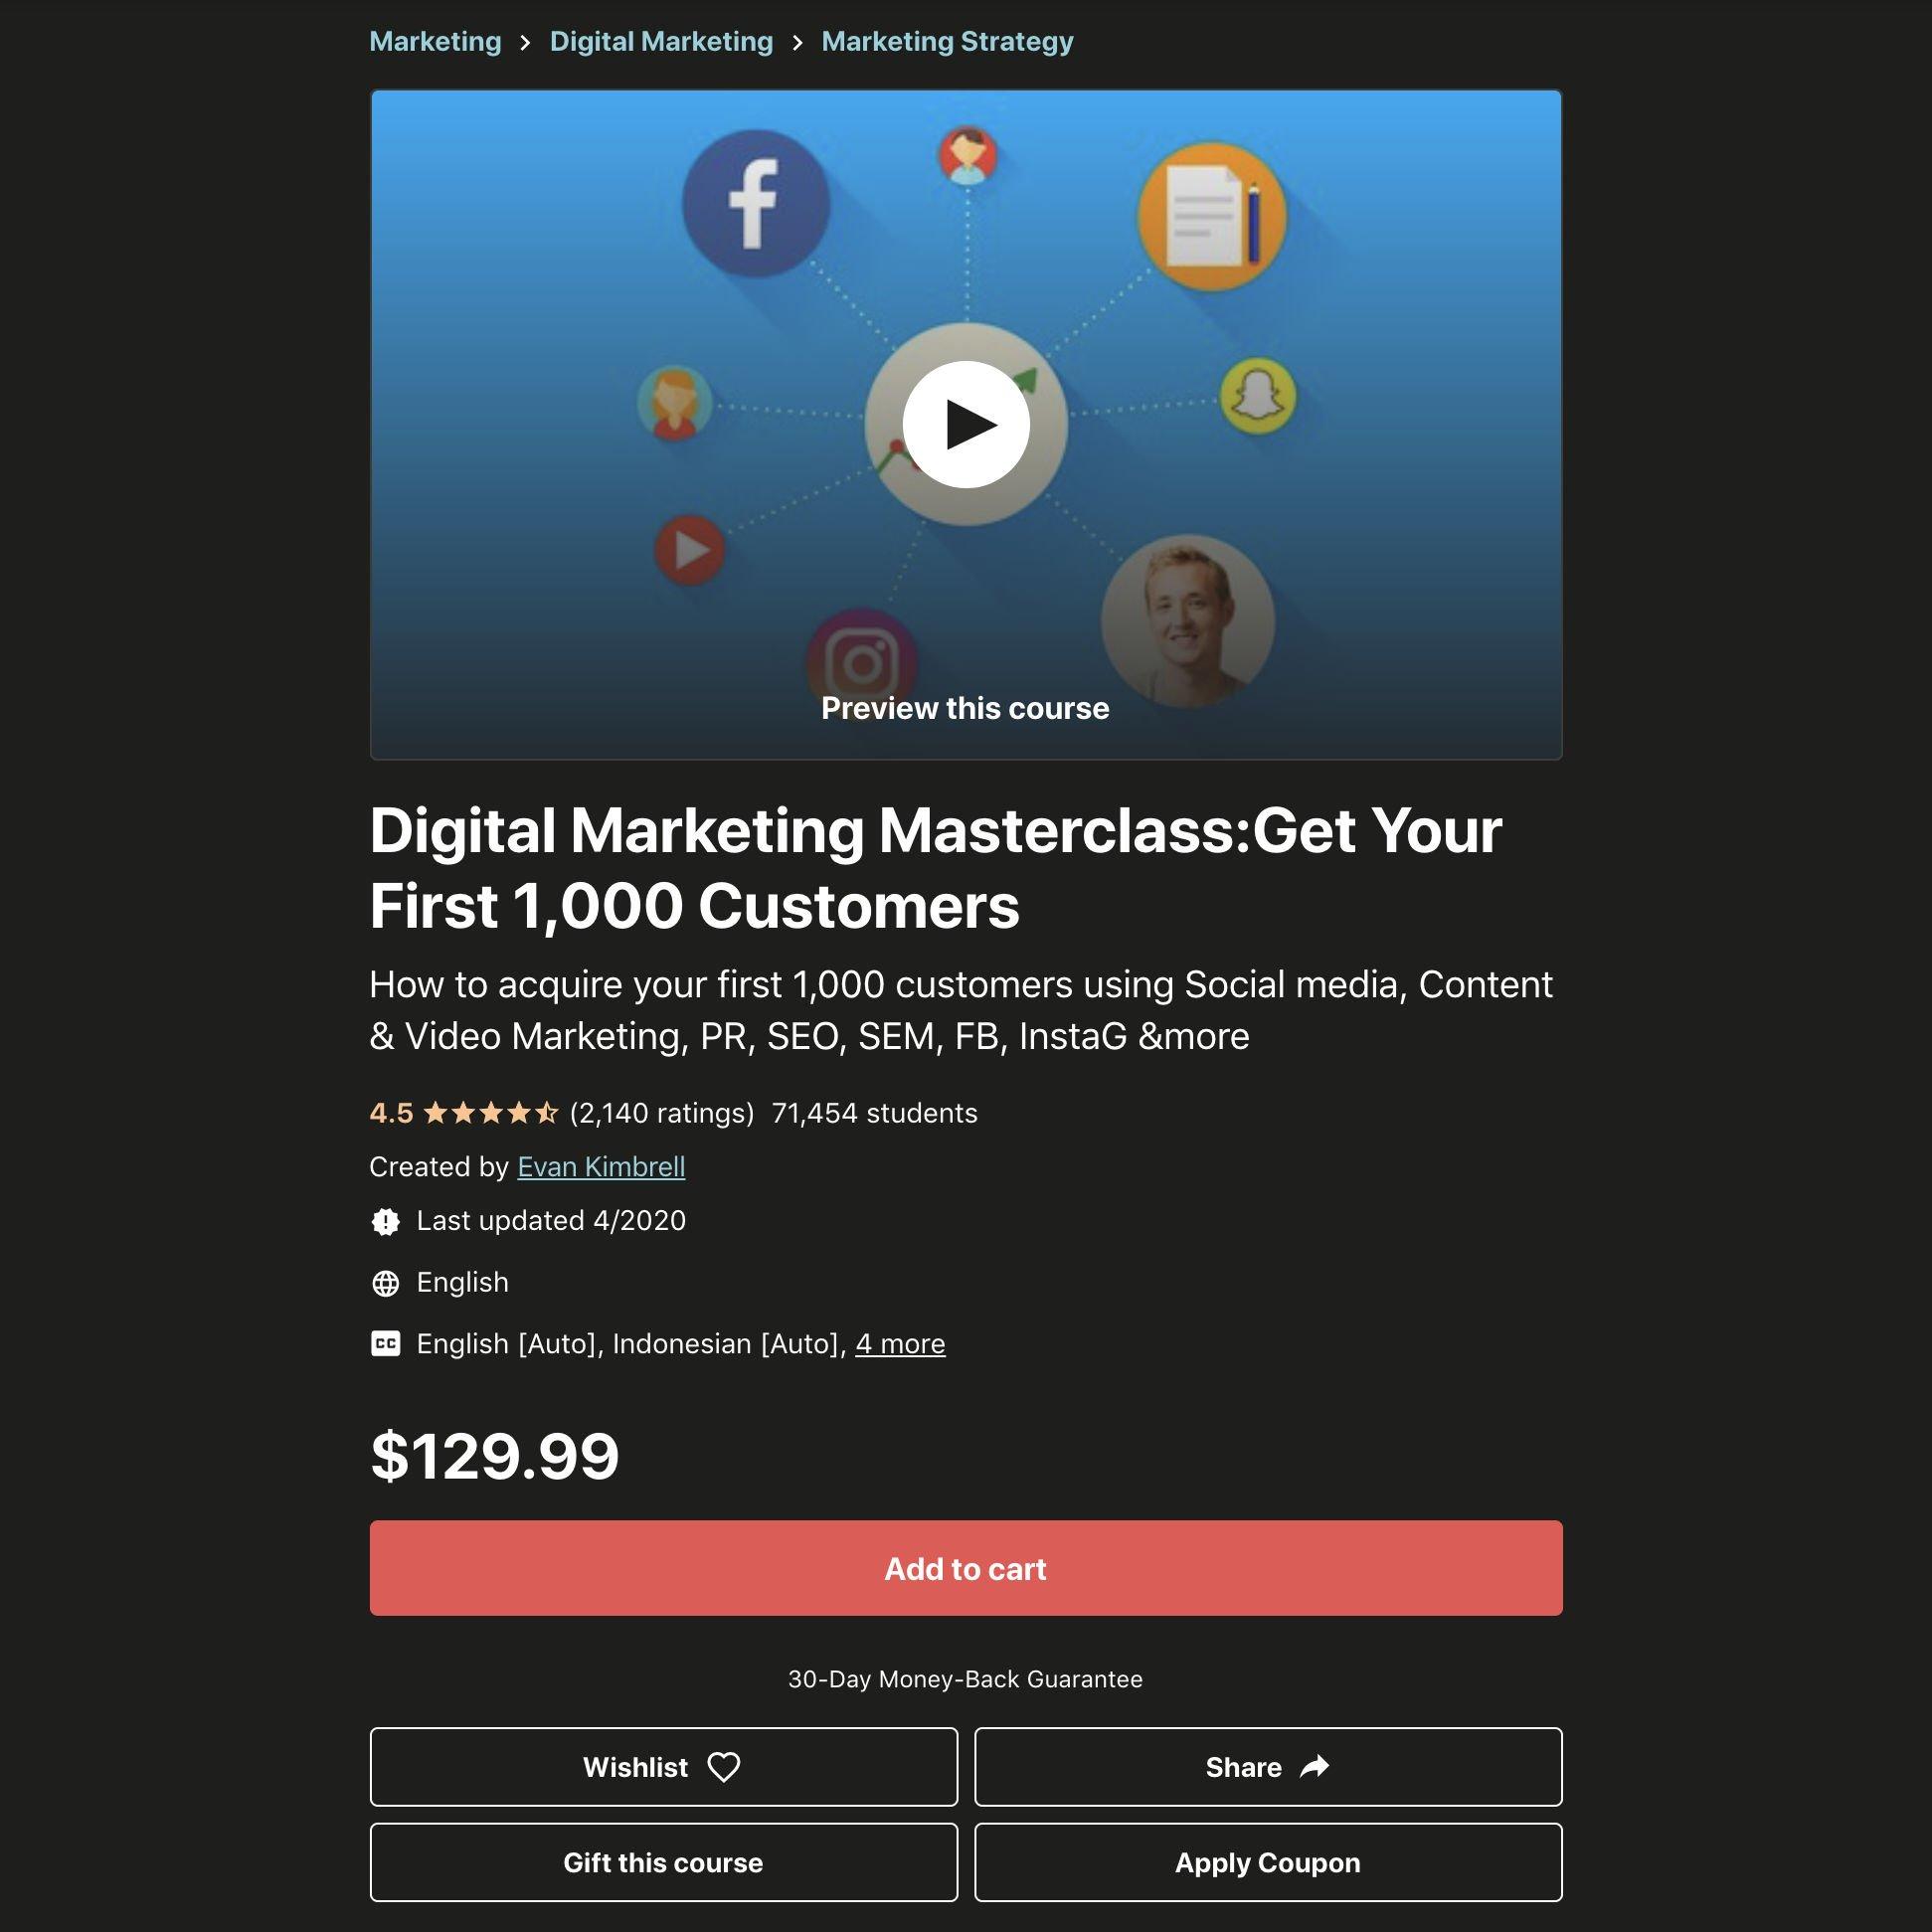 Digital Marketing Masterclass screenshot.